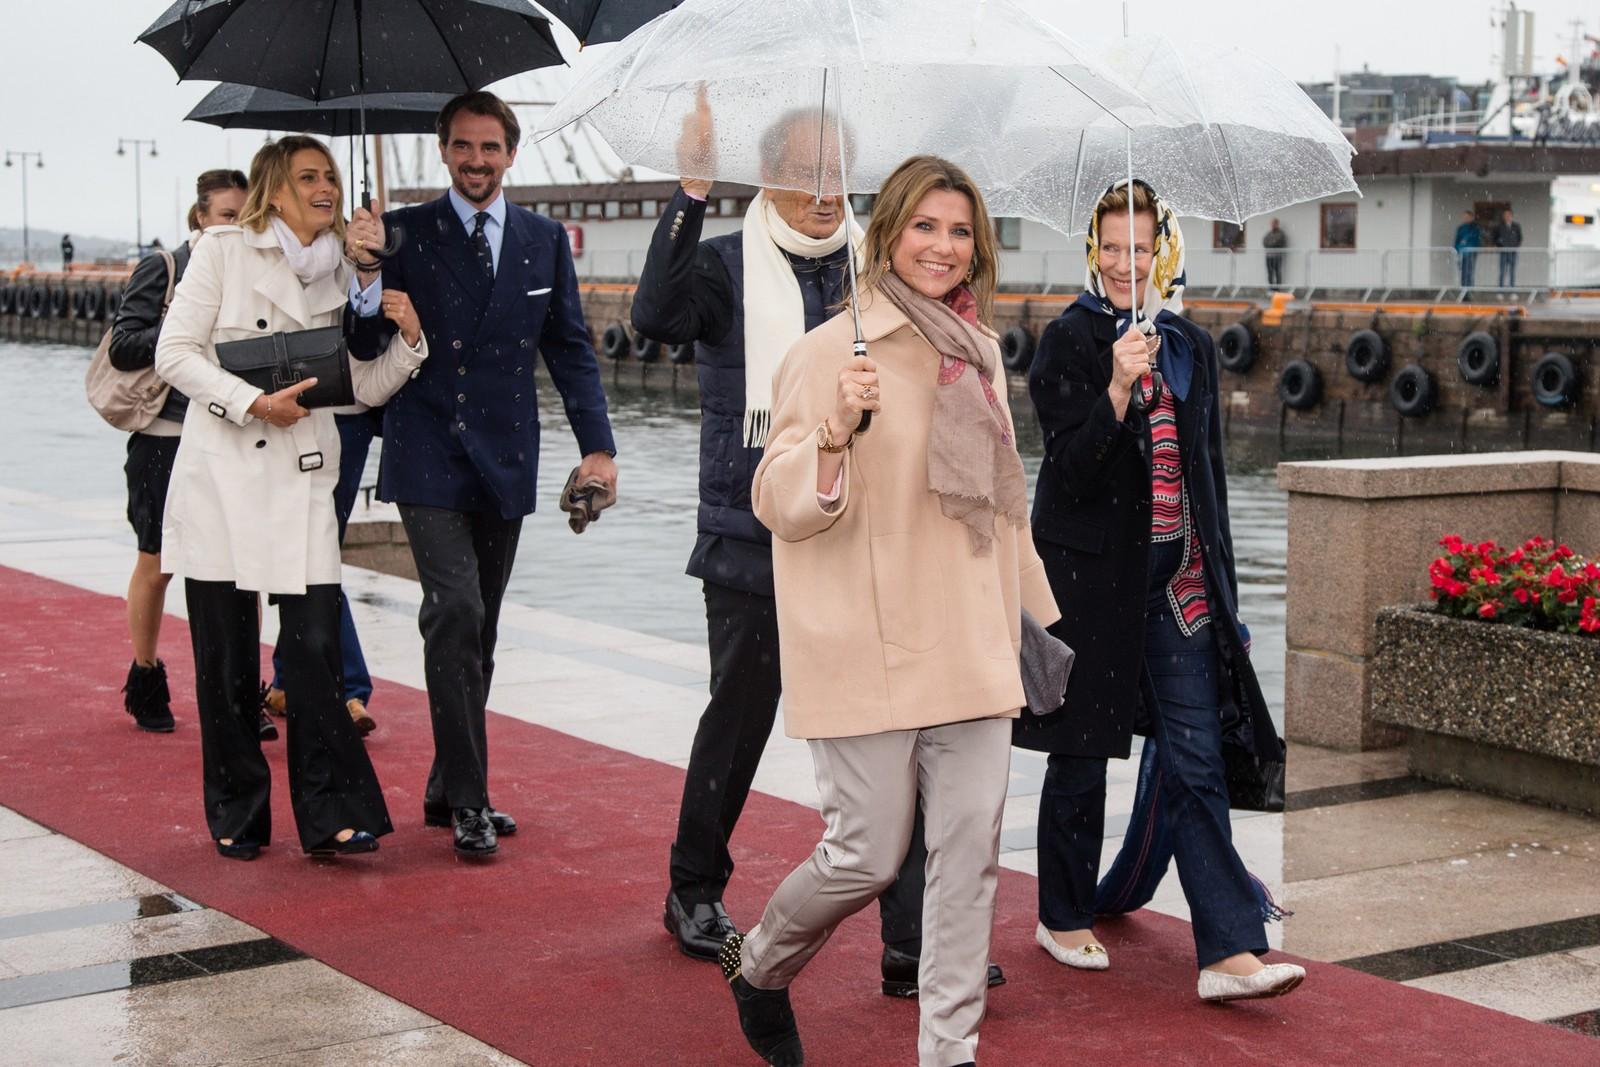 Prinsesse Tatianarins (f.v.) og prins Nikolaos fra Hellas og Prinsesse Märtha Louise ved ankomst på Honnørbrygga i Oslo etter lunsj på Kongeskipet Norge onsdag.